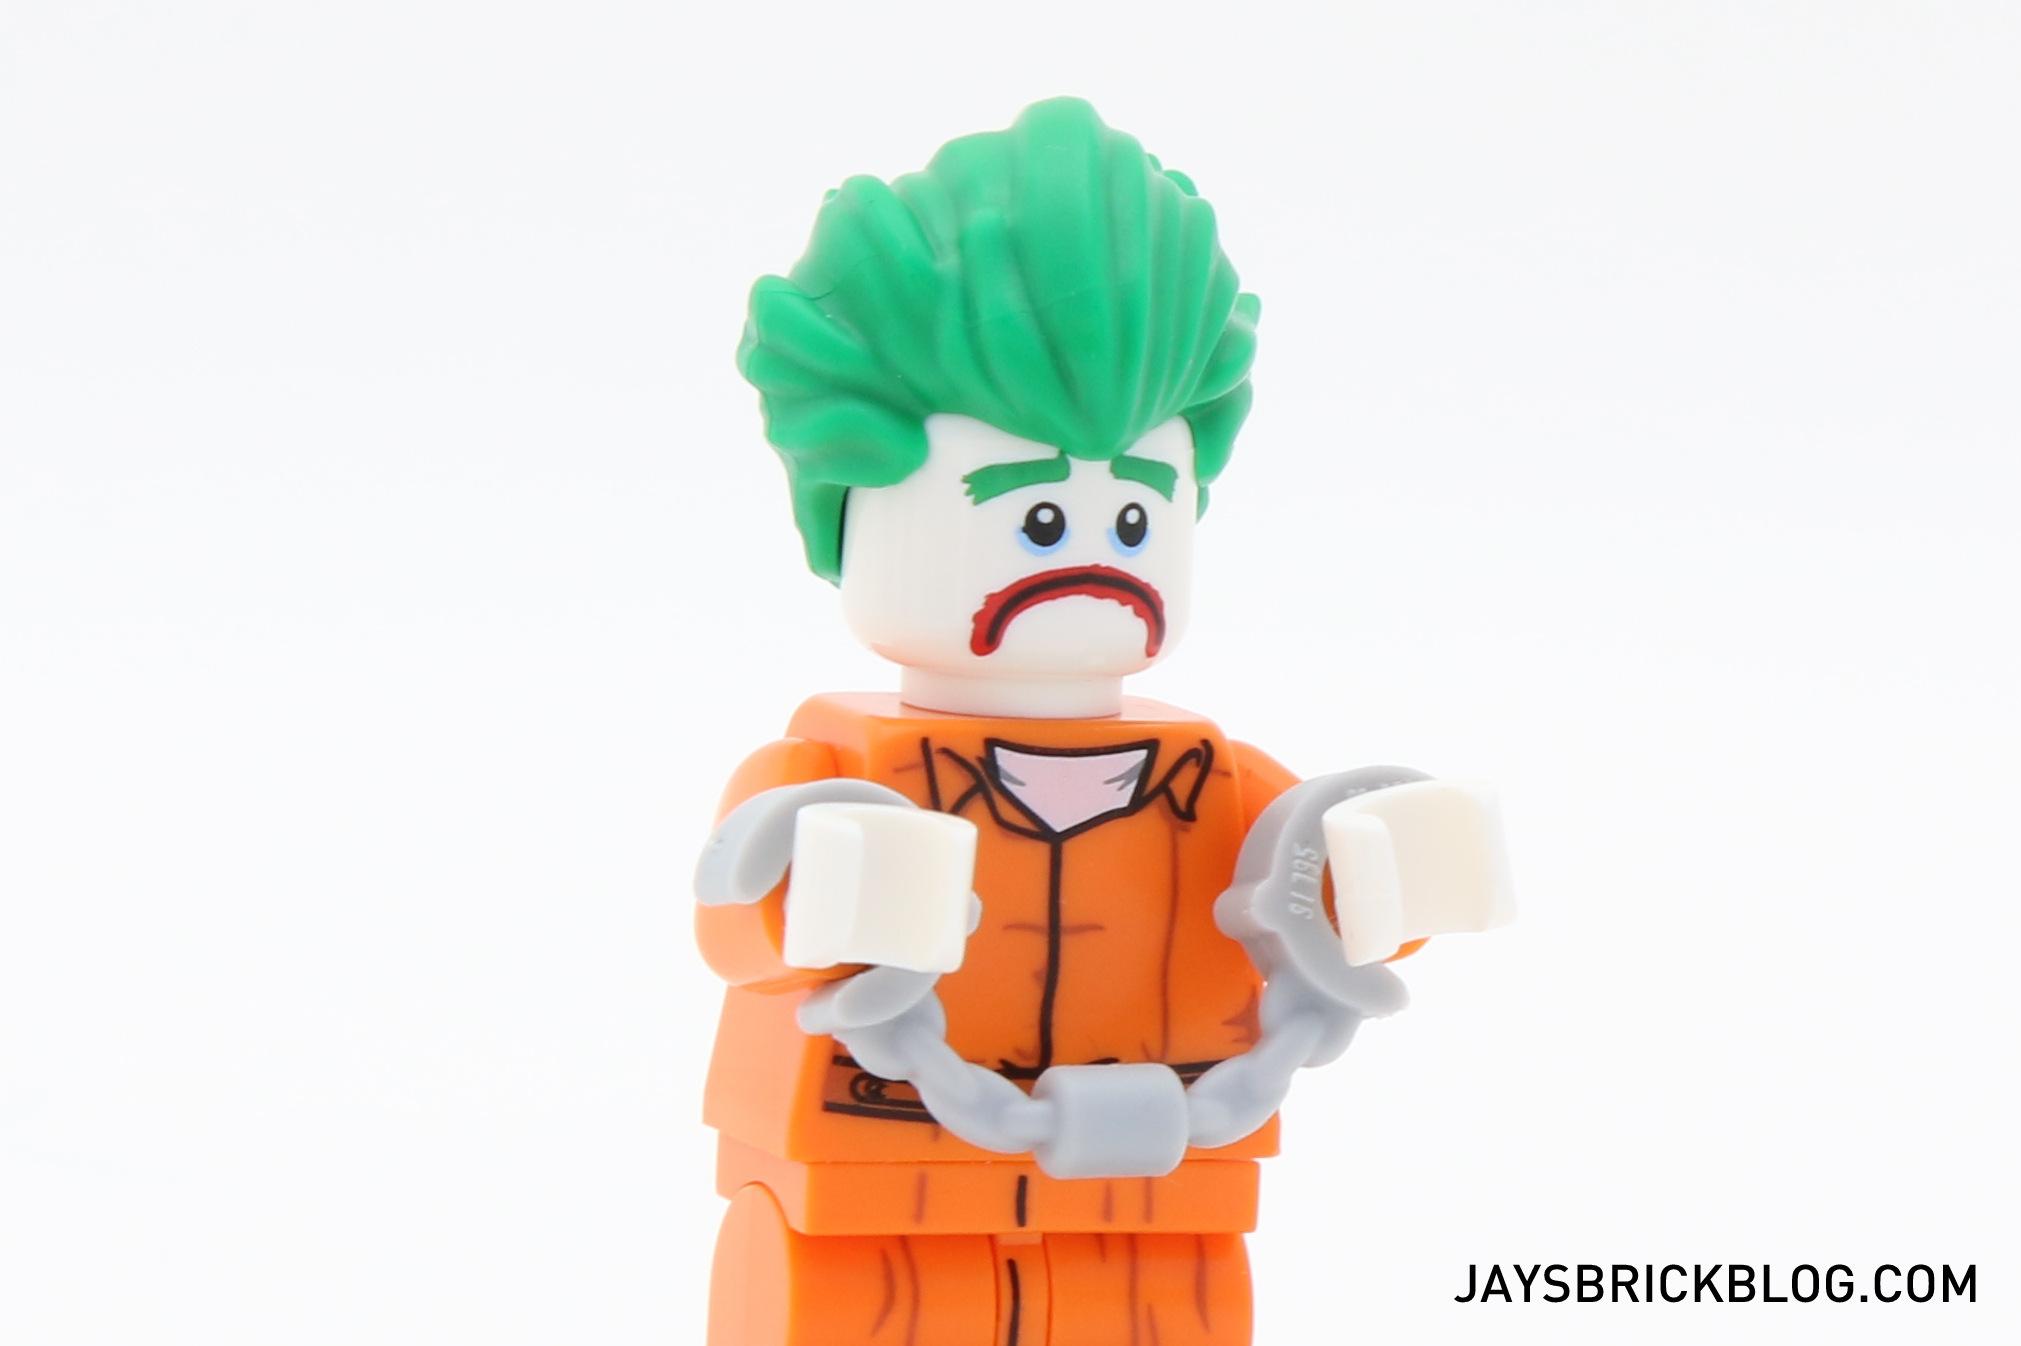 LEGO Batman Movie The Joker ARKHAM ASYLUM Minifigure From 70912